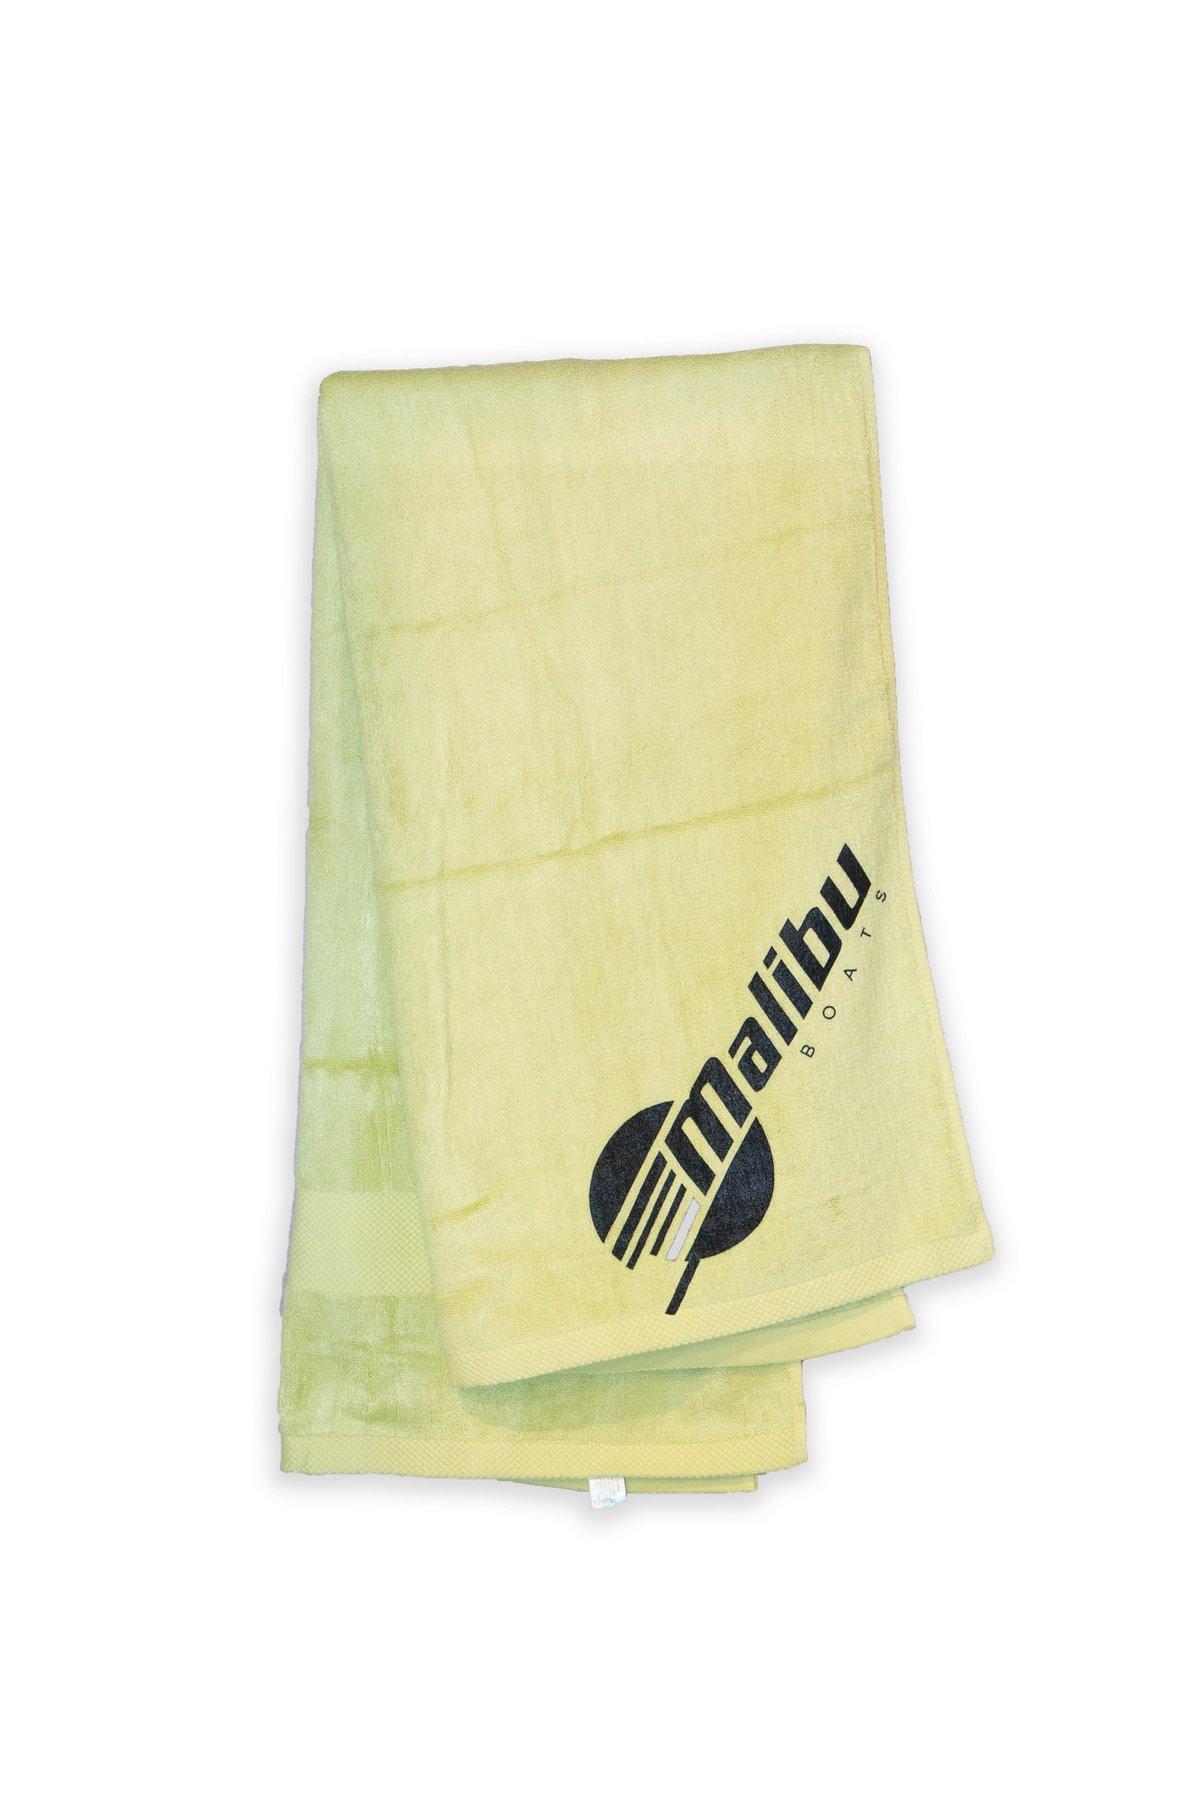 Image of Malibu Bamboo Towel - Lime